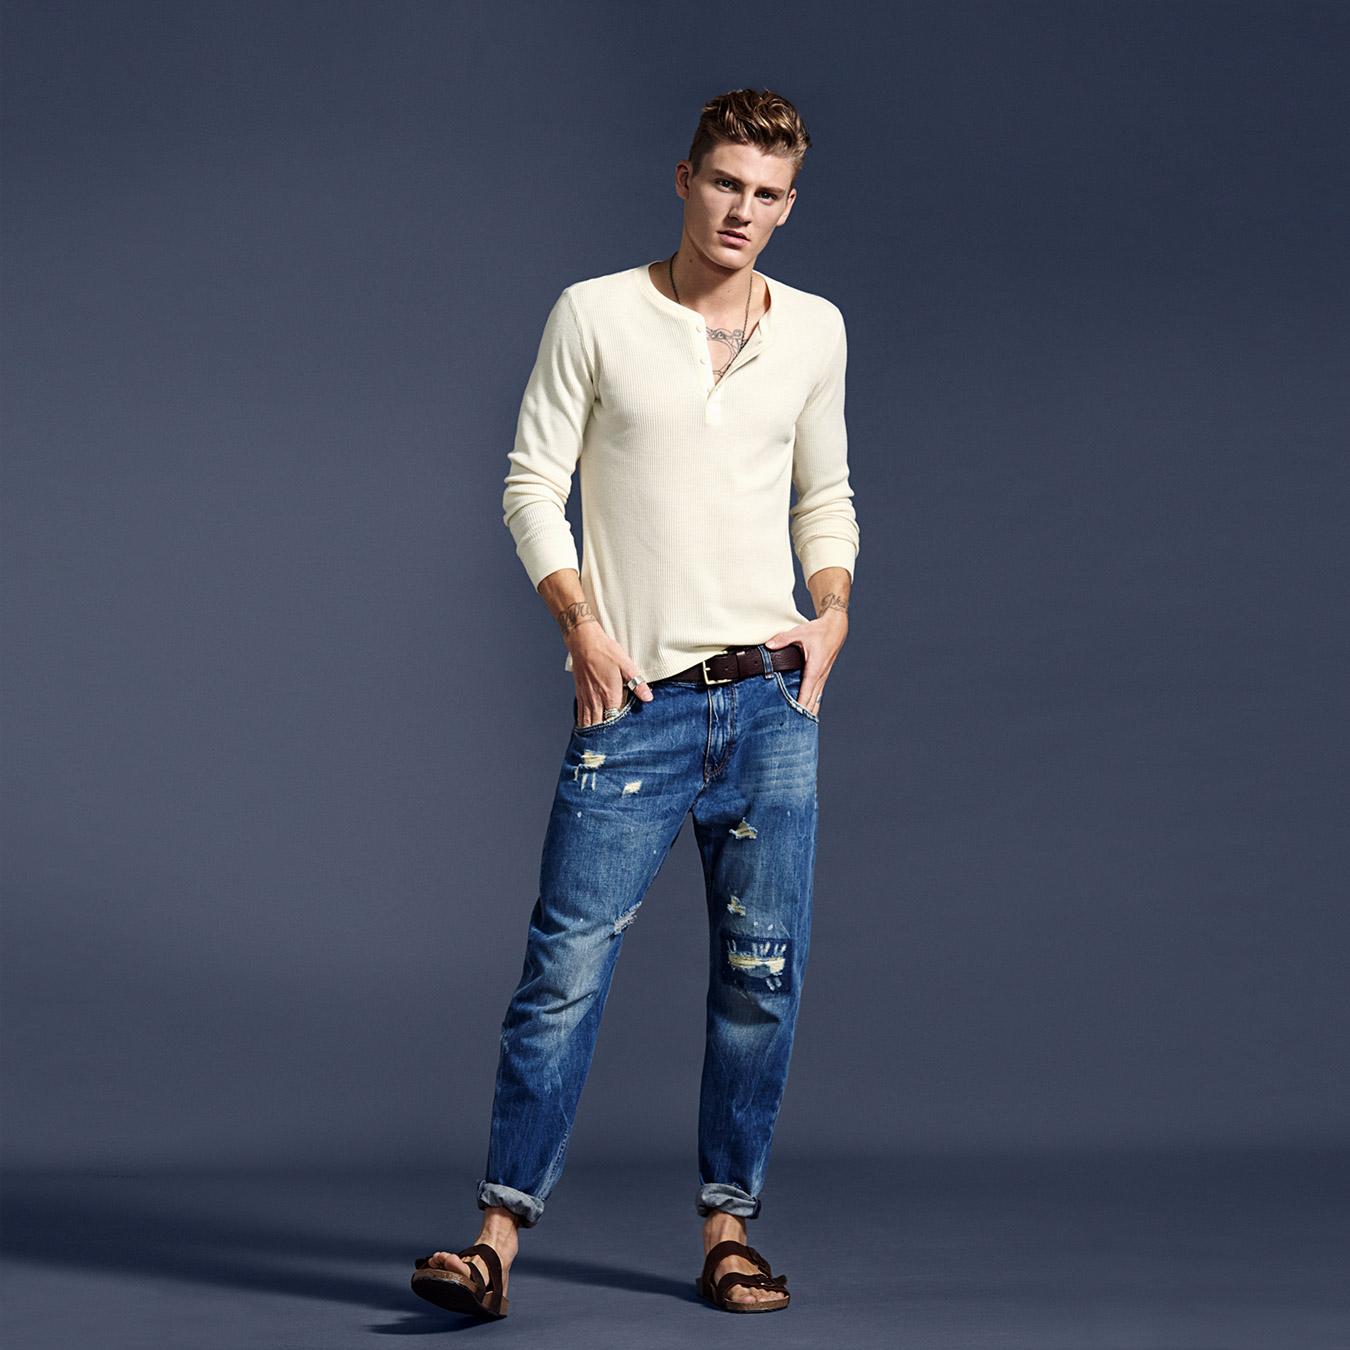 Men S Fashion Stylists